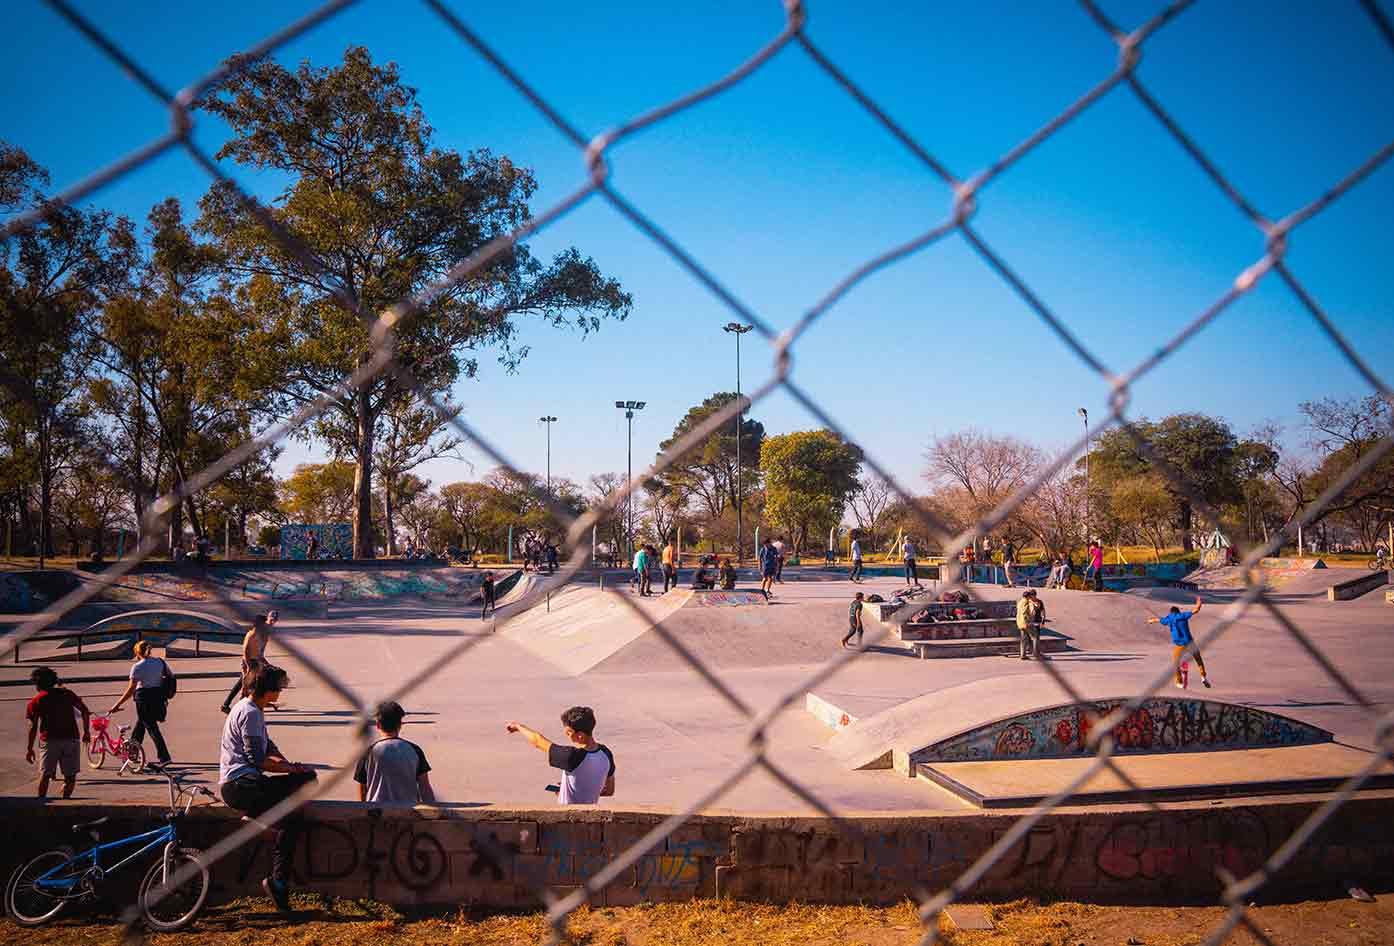 cordoba argentina skate park